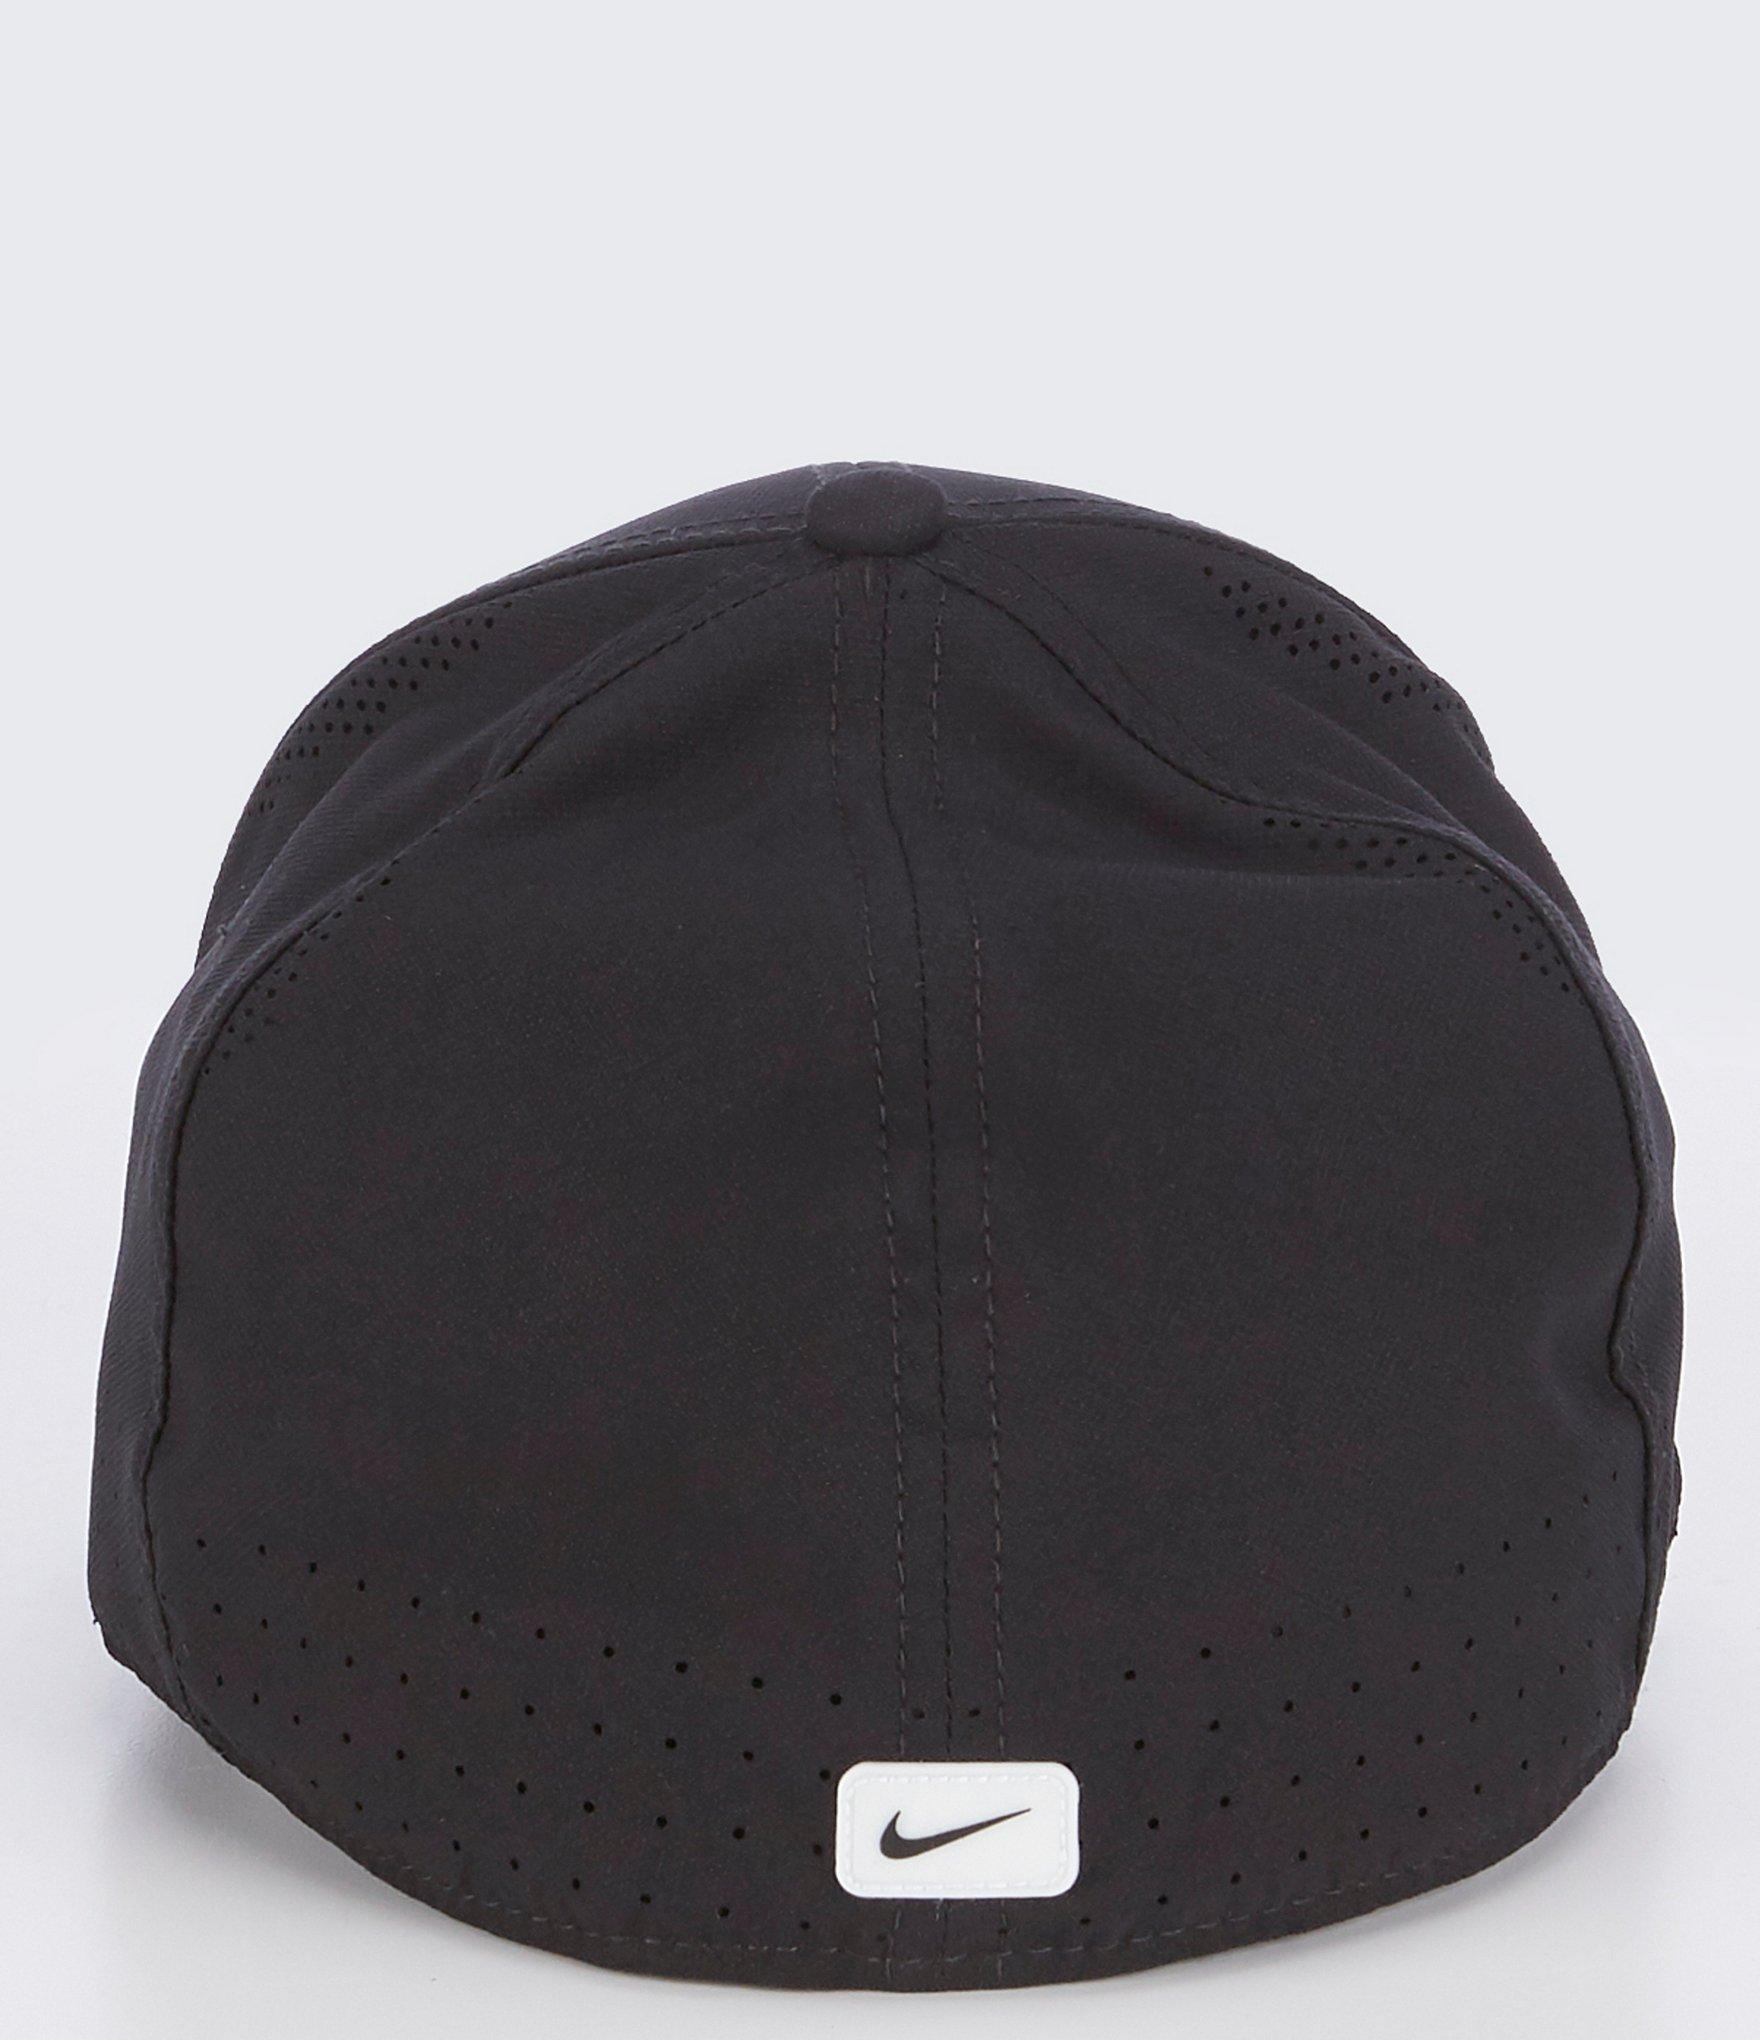 0201deebabd72 Nike - Black Aerobill Classic 99 Hat for Men - Lyst. View fullscreen